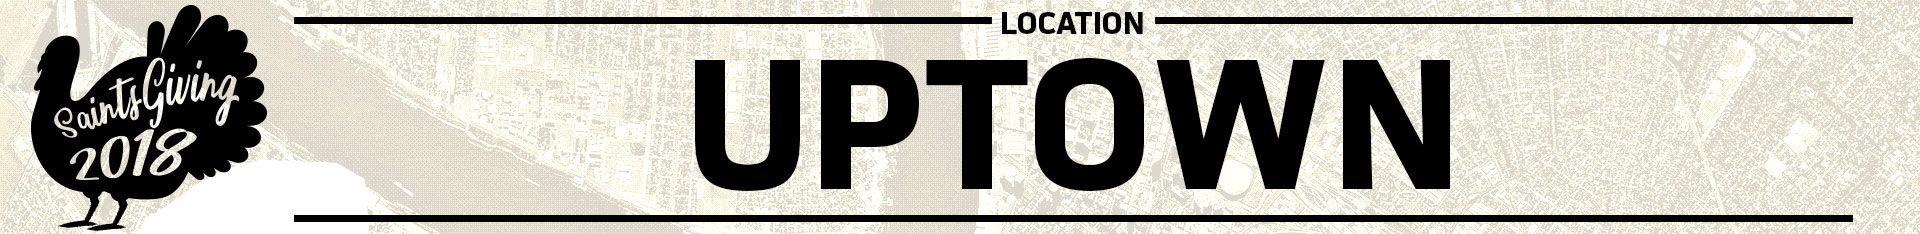 Promo-Saintsgiving-Uptown-1920-112418